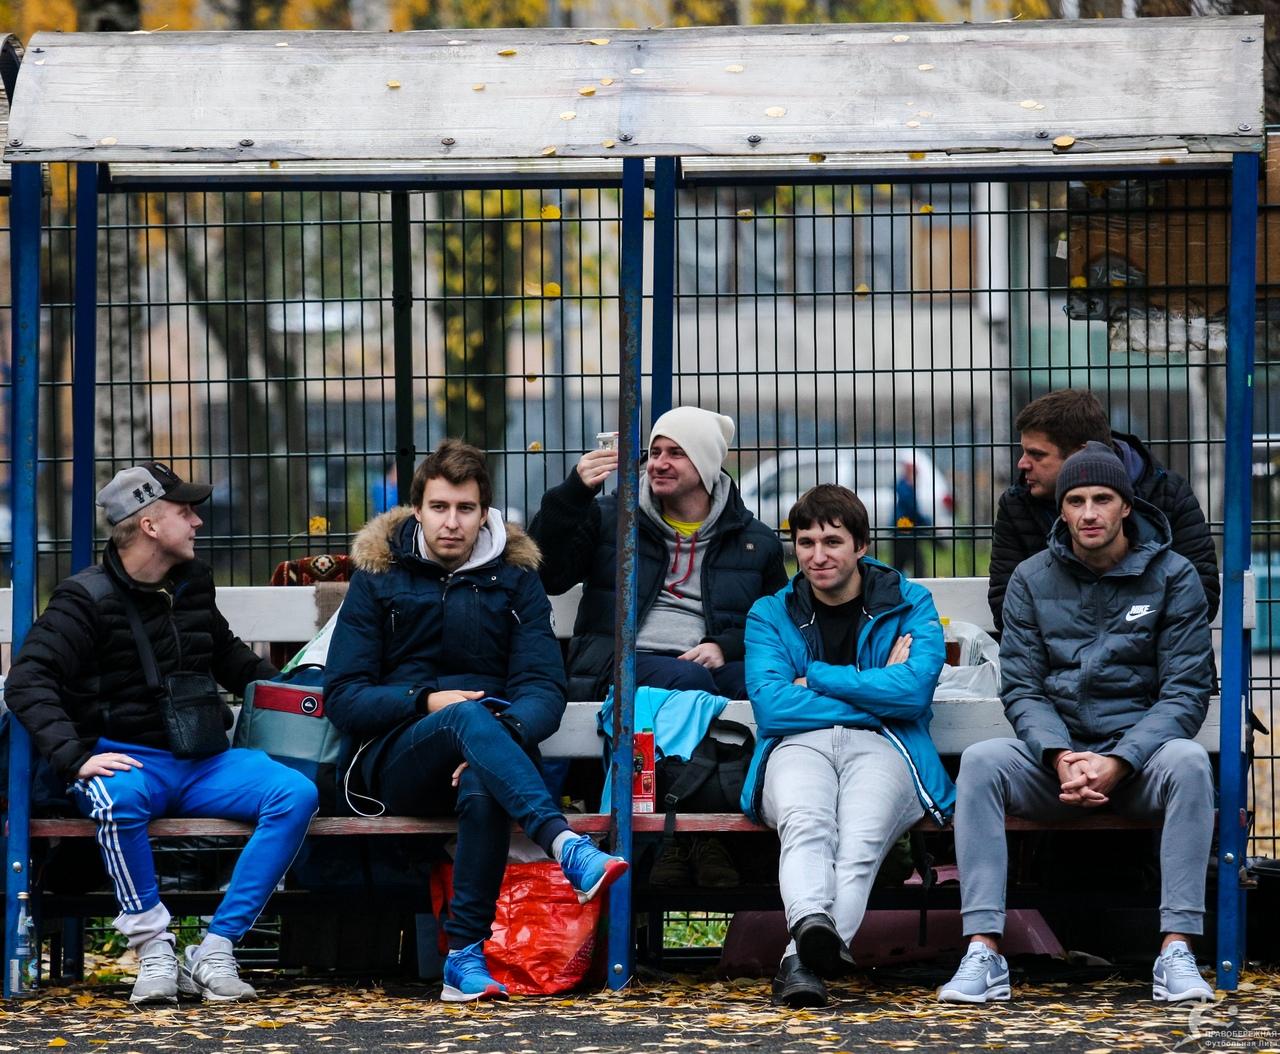 Даниил Волченков, Дмитрий Лявданский, Павел Алексеев, Ярослав Кяйвяряйнен, Андрей Наумочкин, Антон Салов.